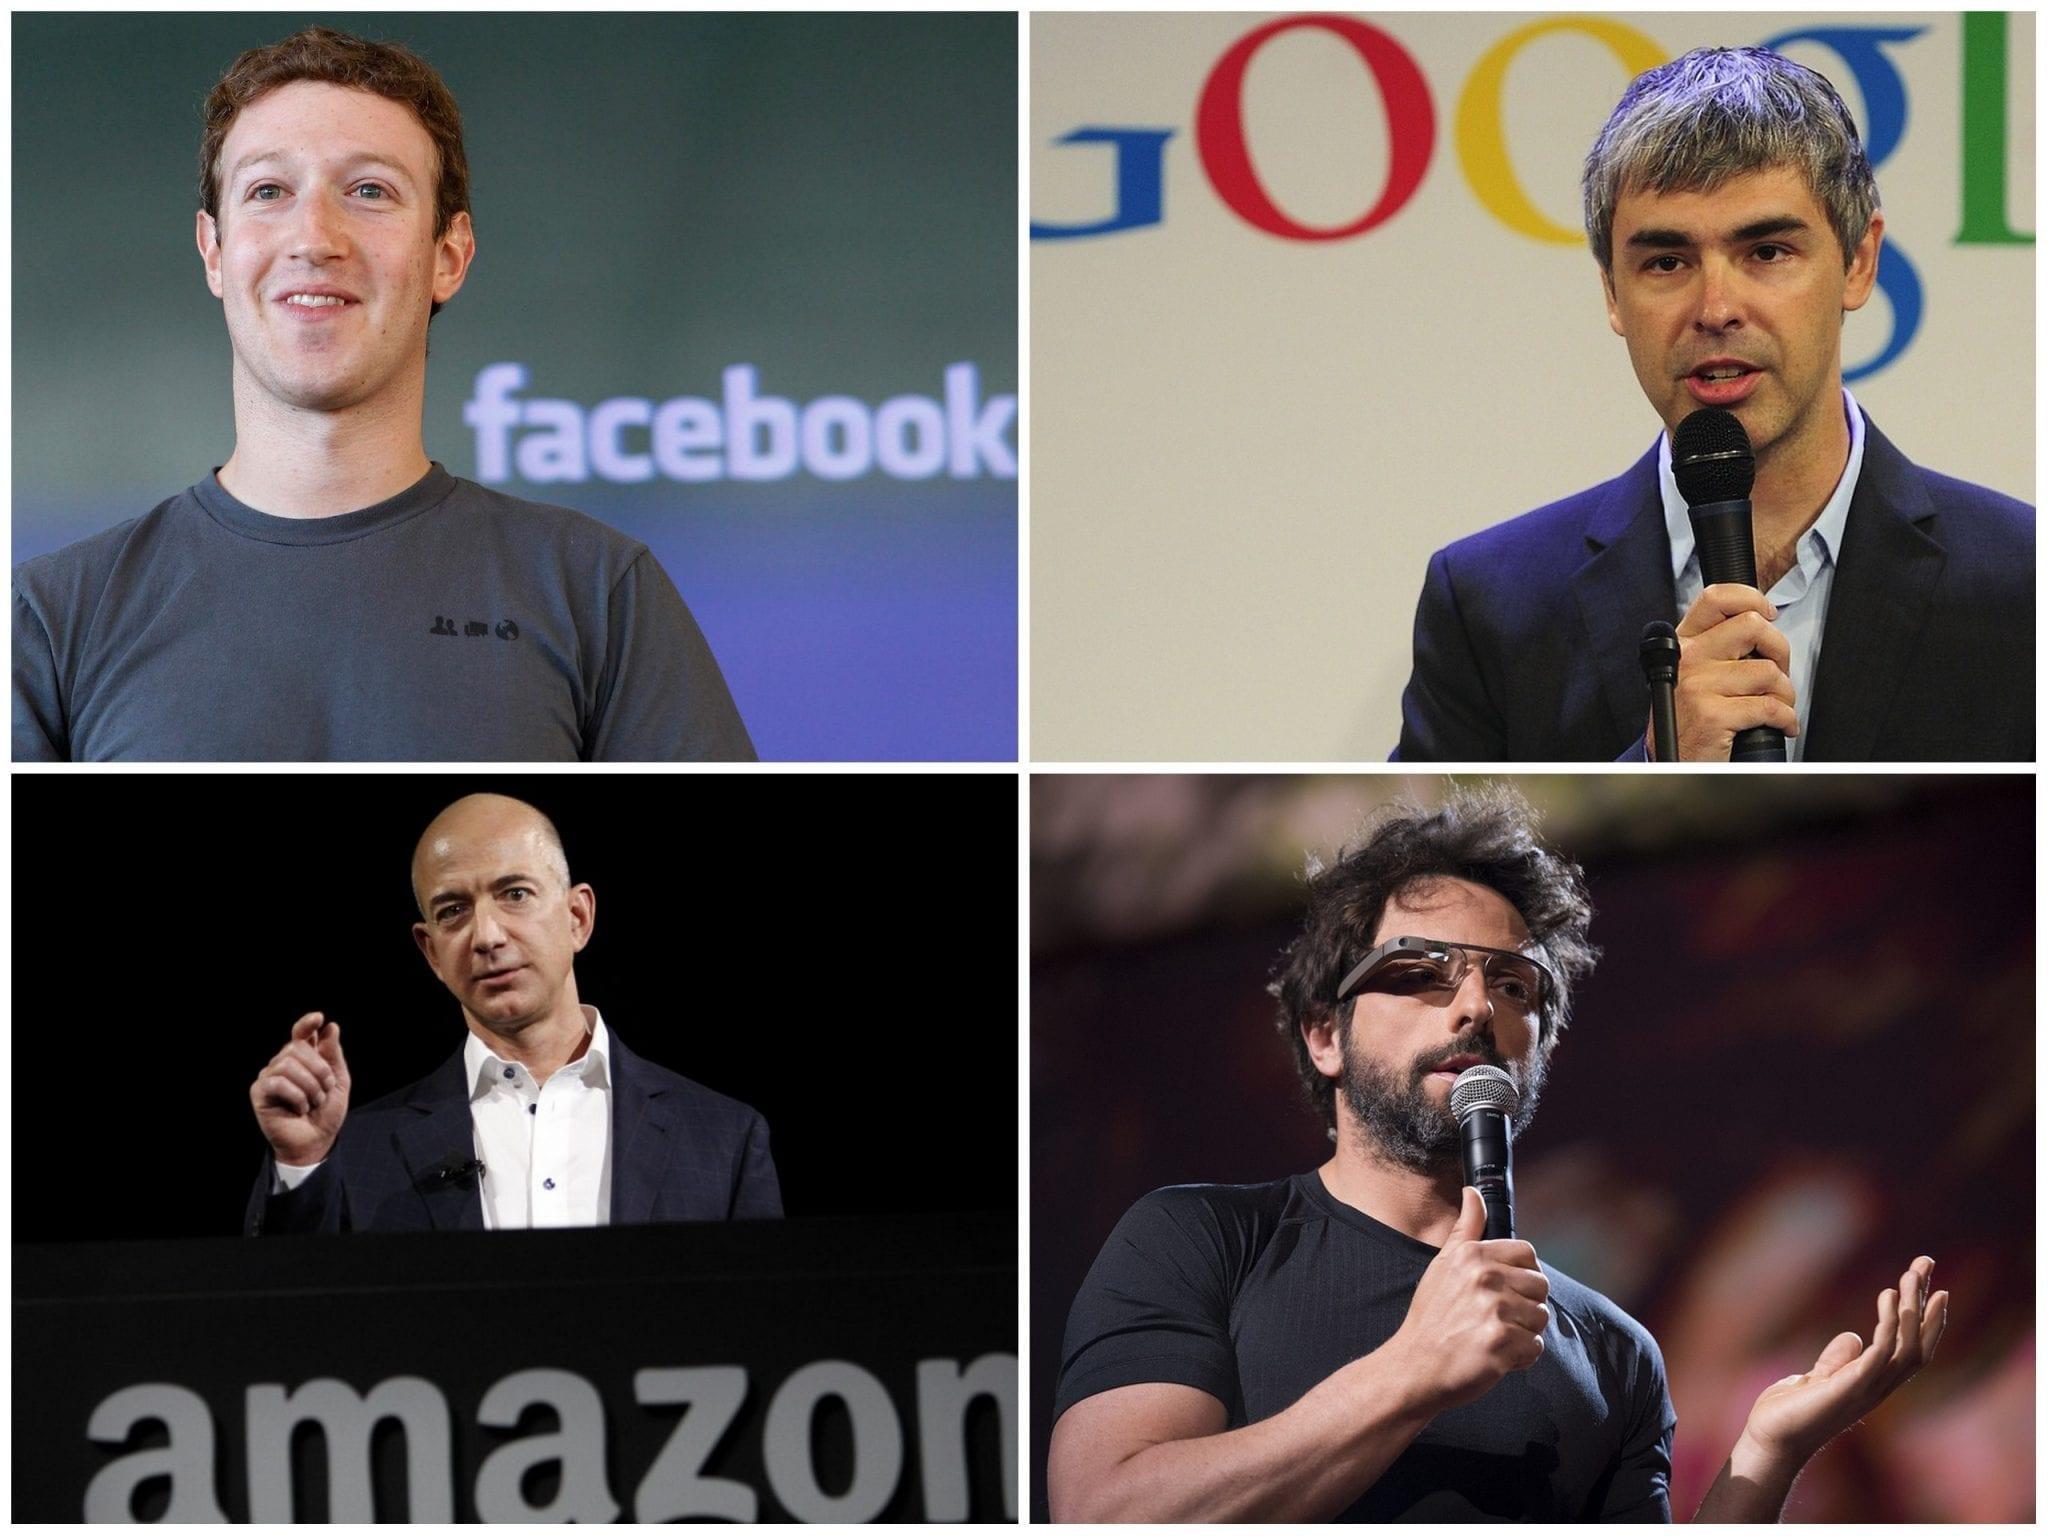 Mark Zuckerberg, Jeff Bezos or Larry Page & Sergey Brin